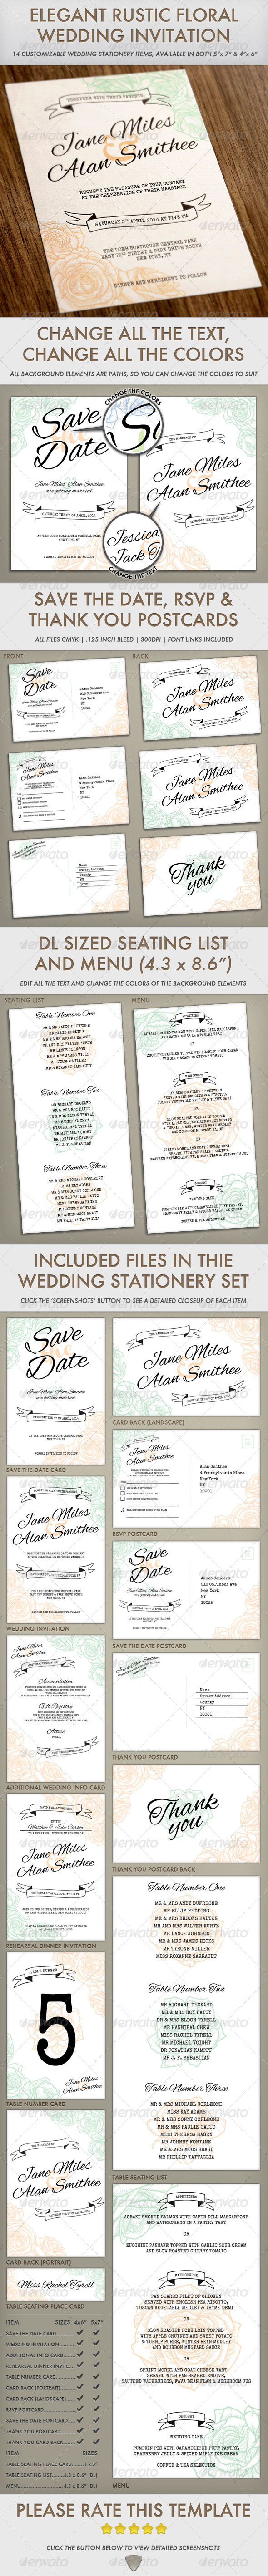 GraphicRiver Elegant Rustic Floral Wedding Invitation 7780848